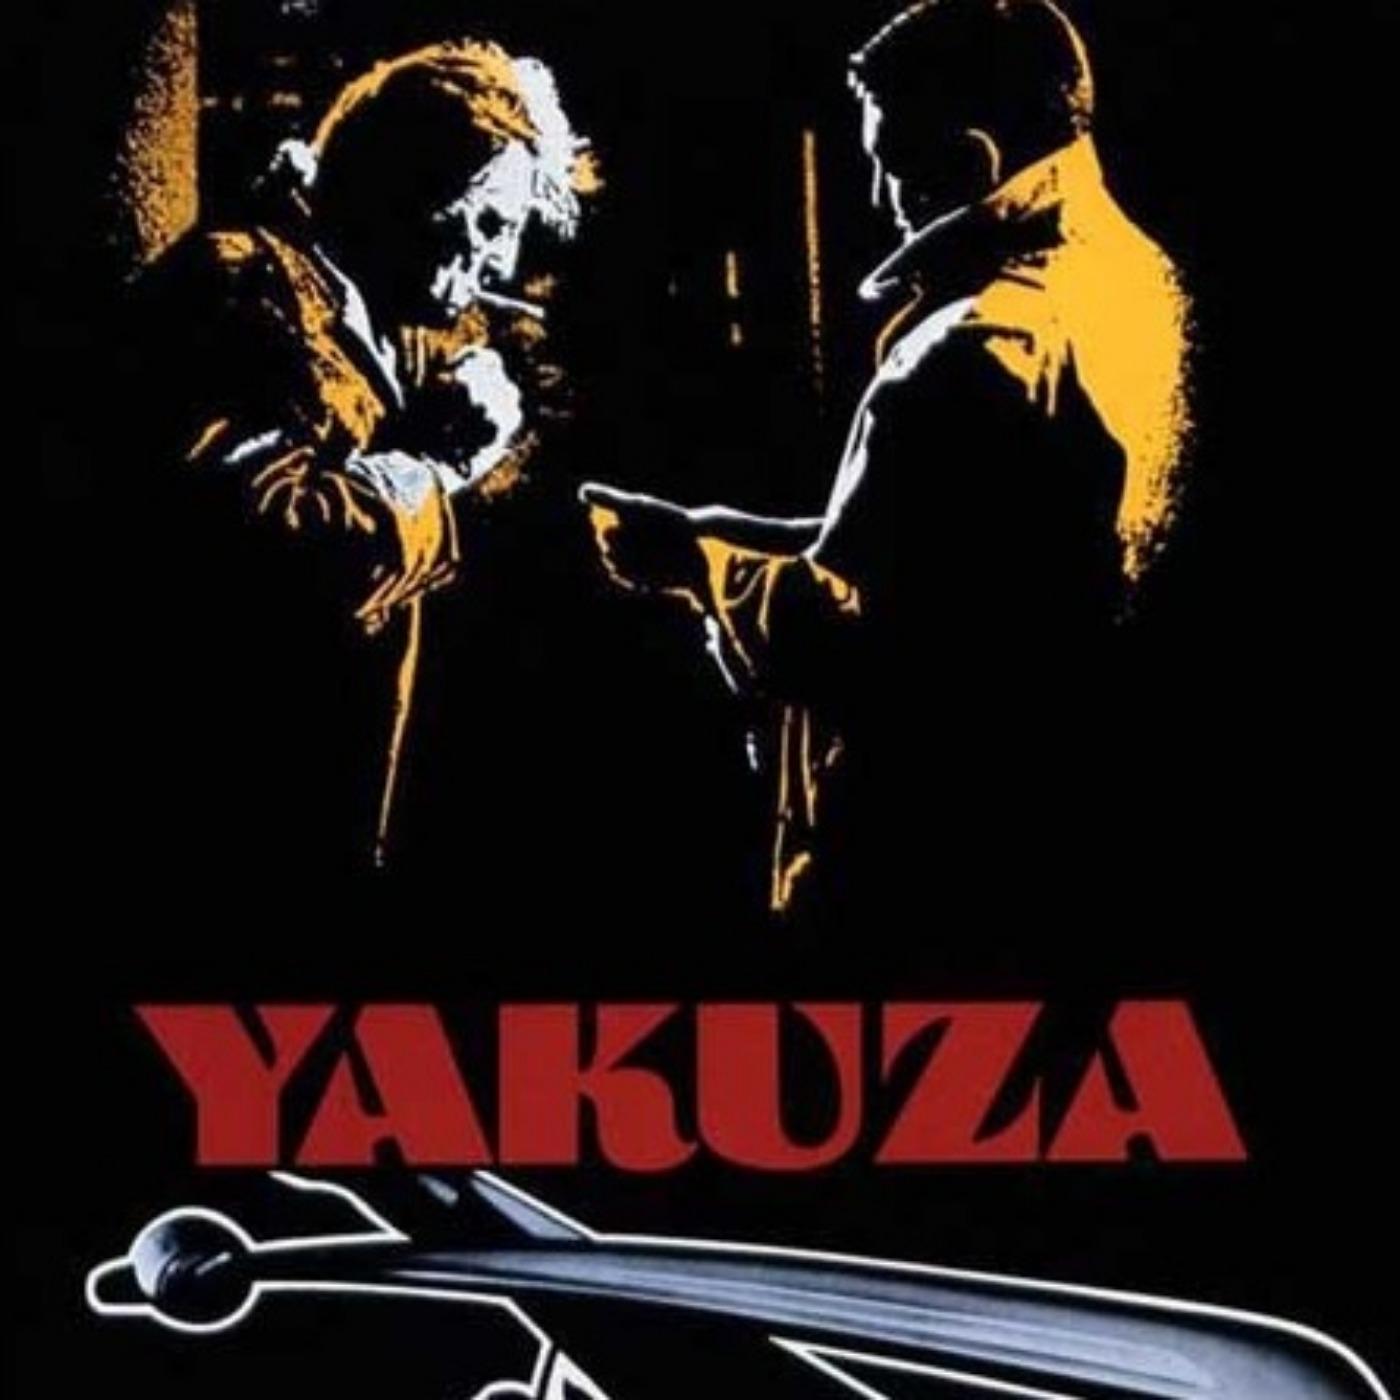 PODCAST CINEMA | Critique du film THE YAKUZA | CinéMaRadio